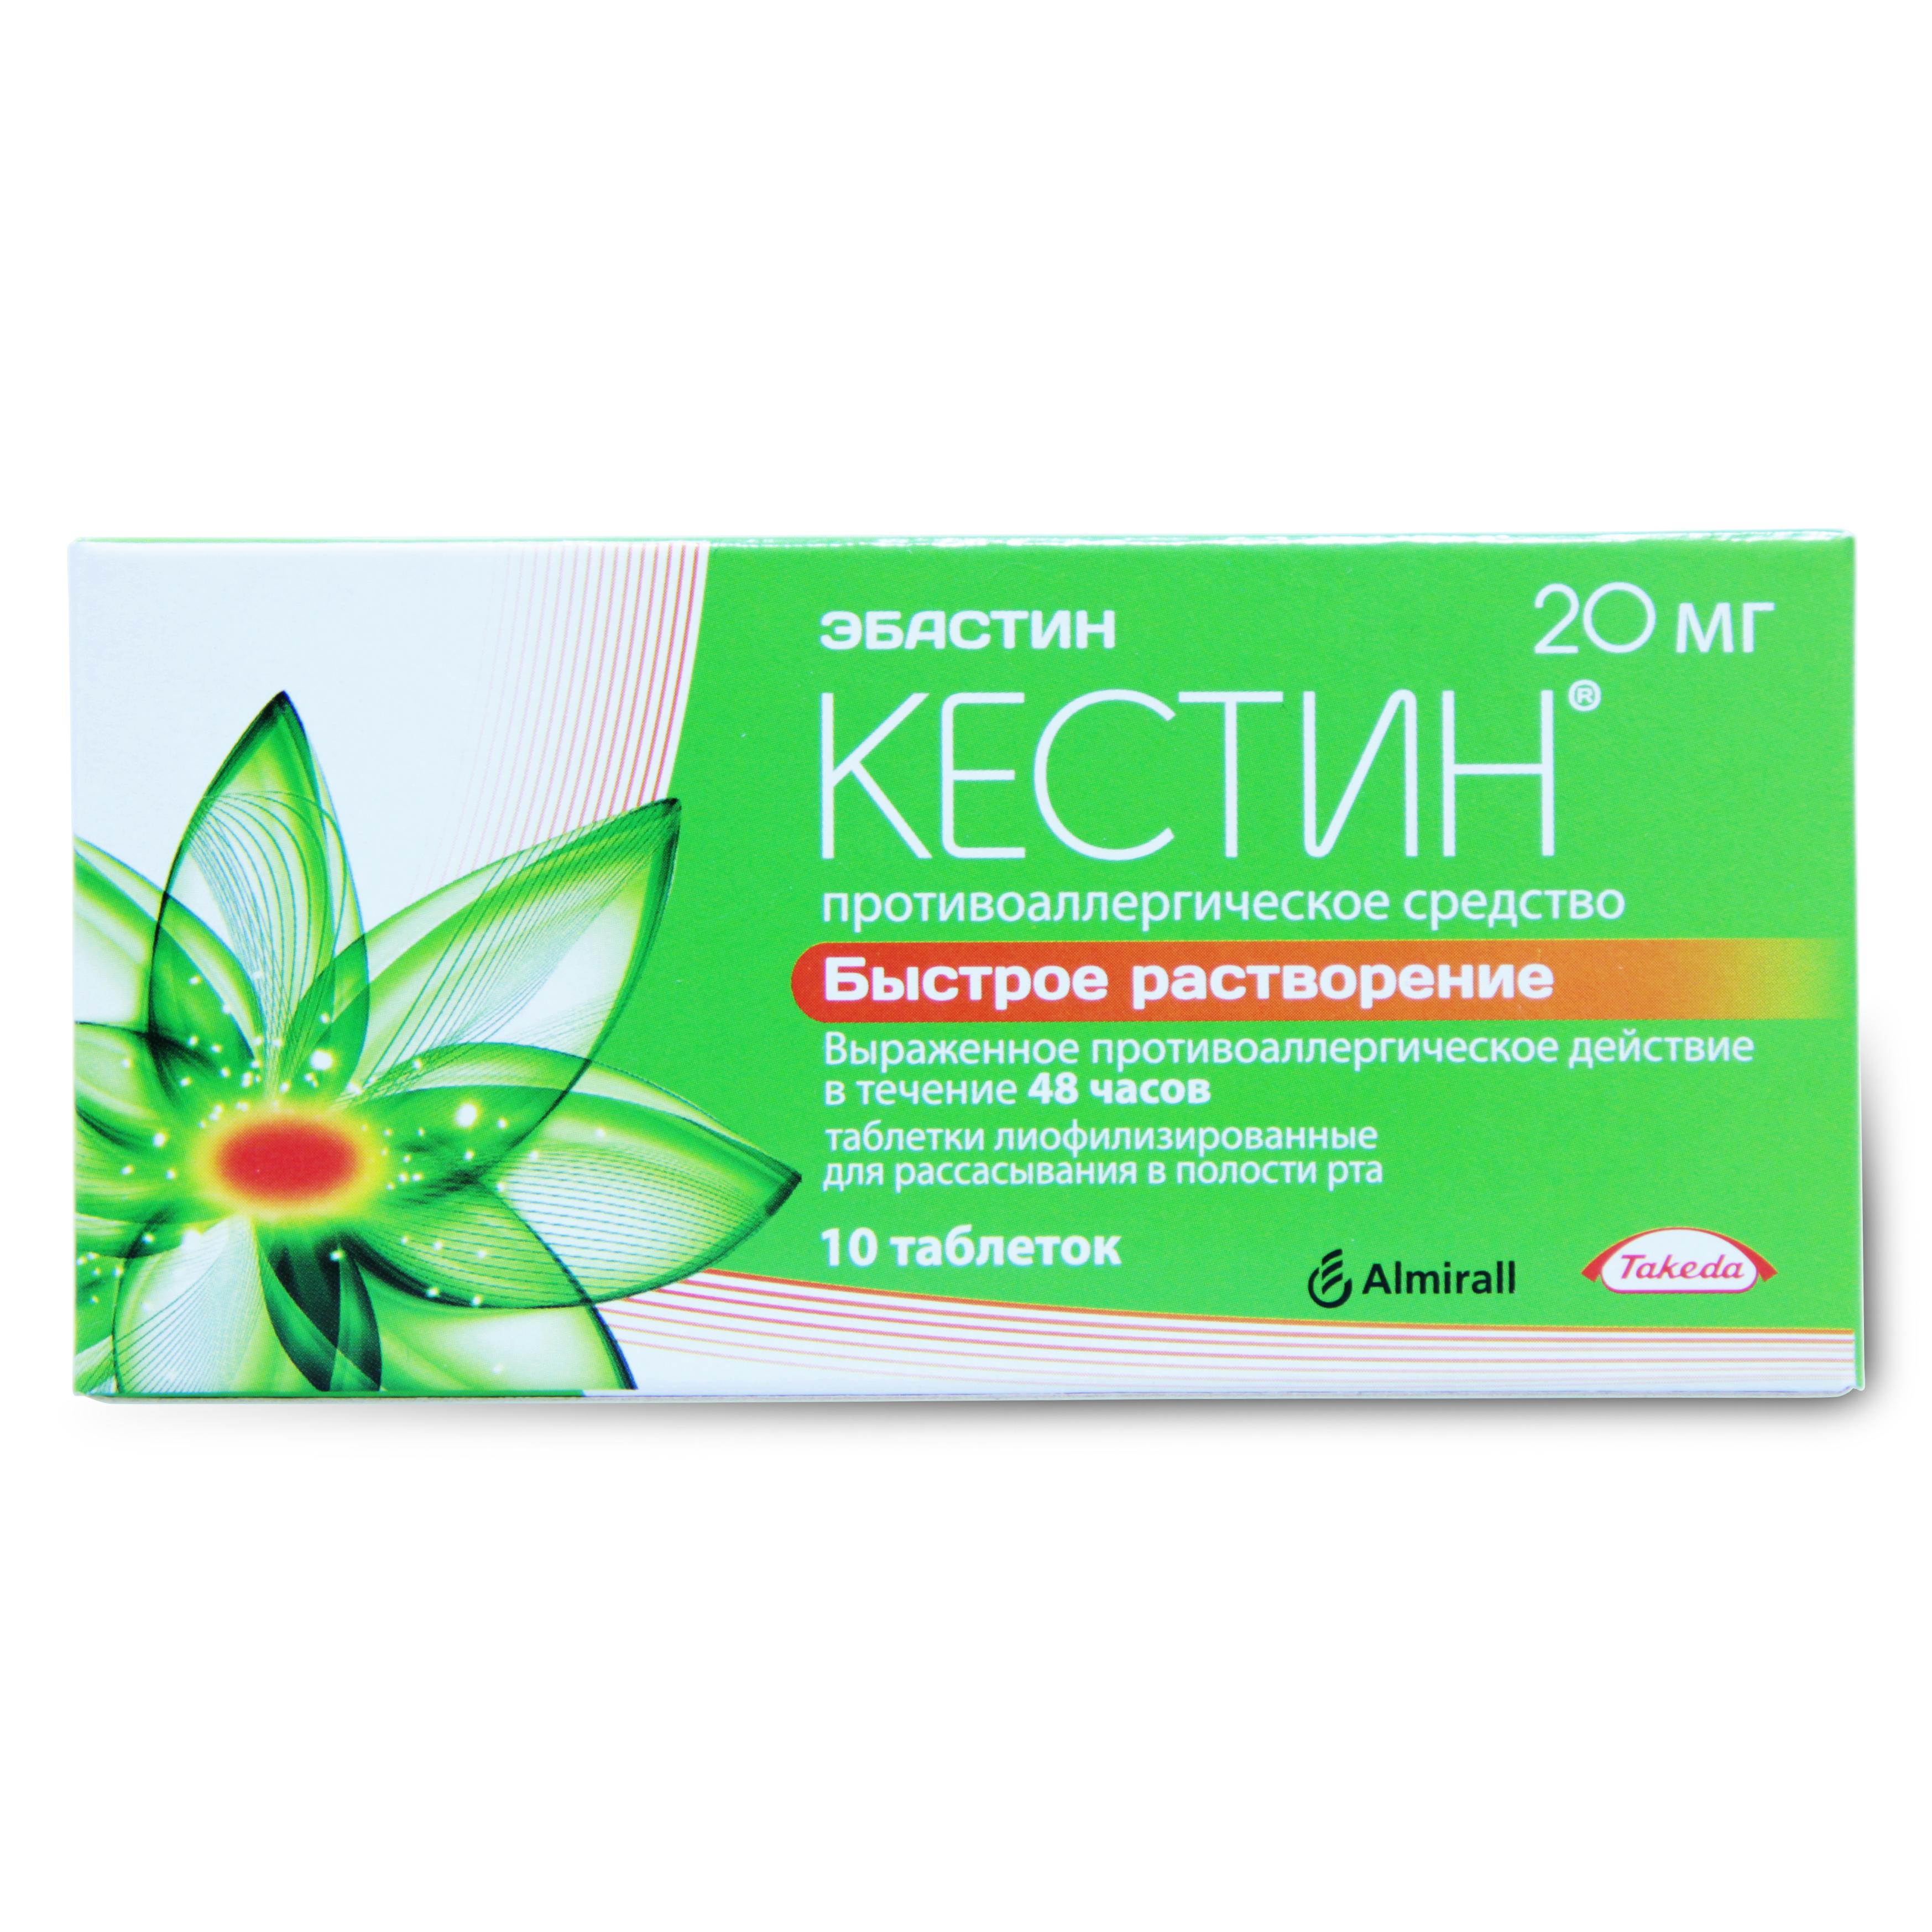 Кестин  таблетки для рассасывания 20мг 10шт (Индастриас Фармасьютикас Алмирал Продесфарма)